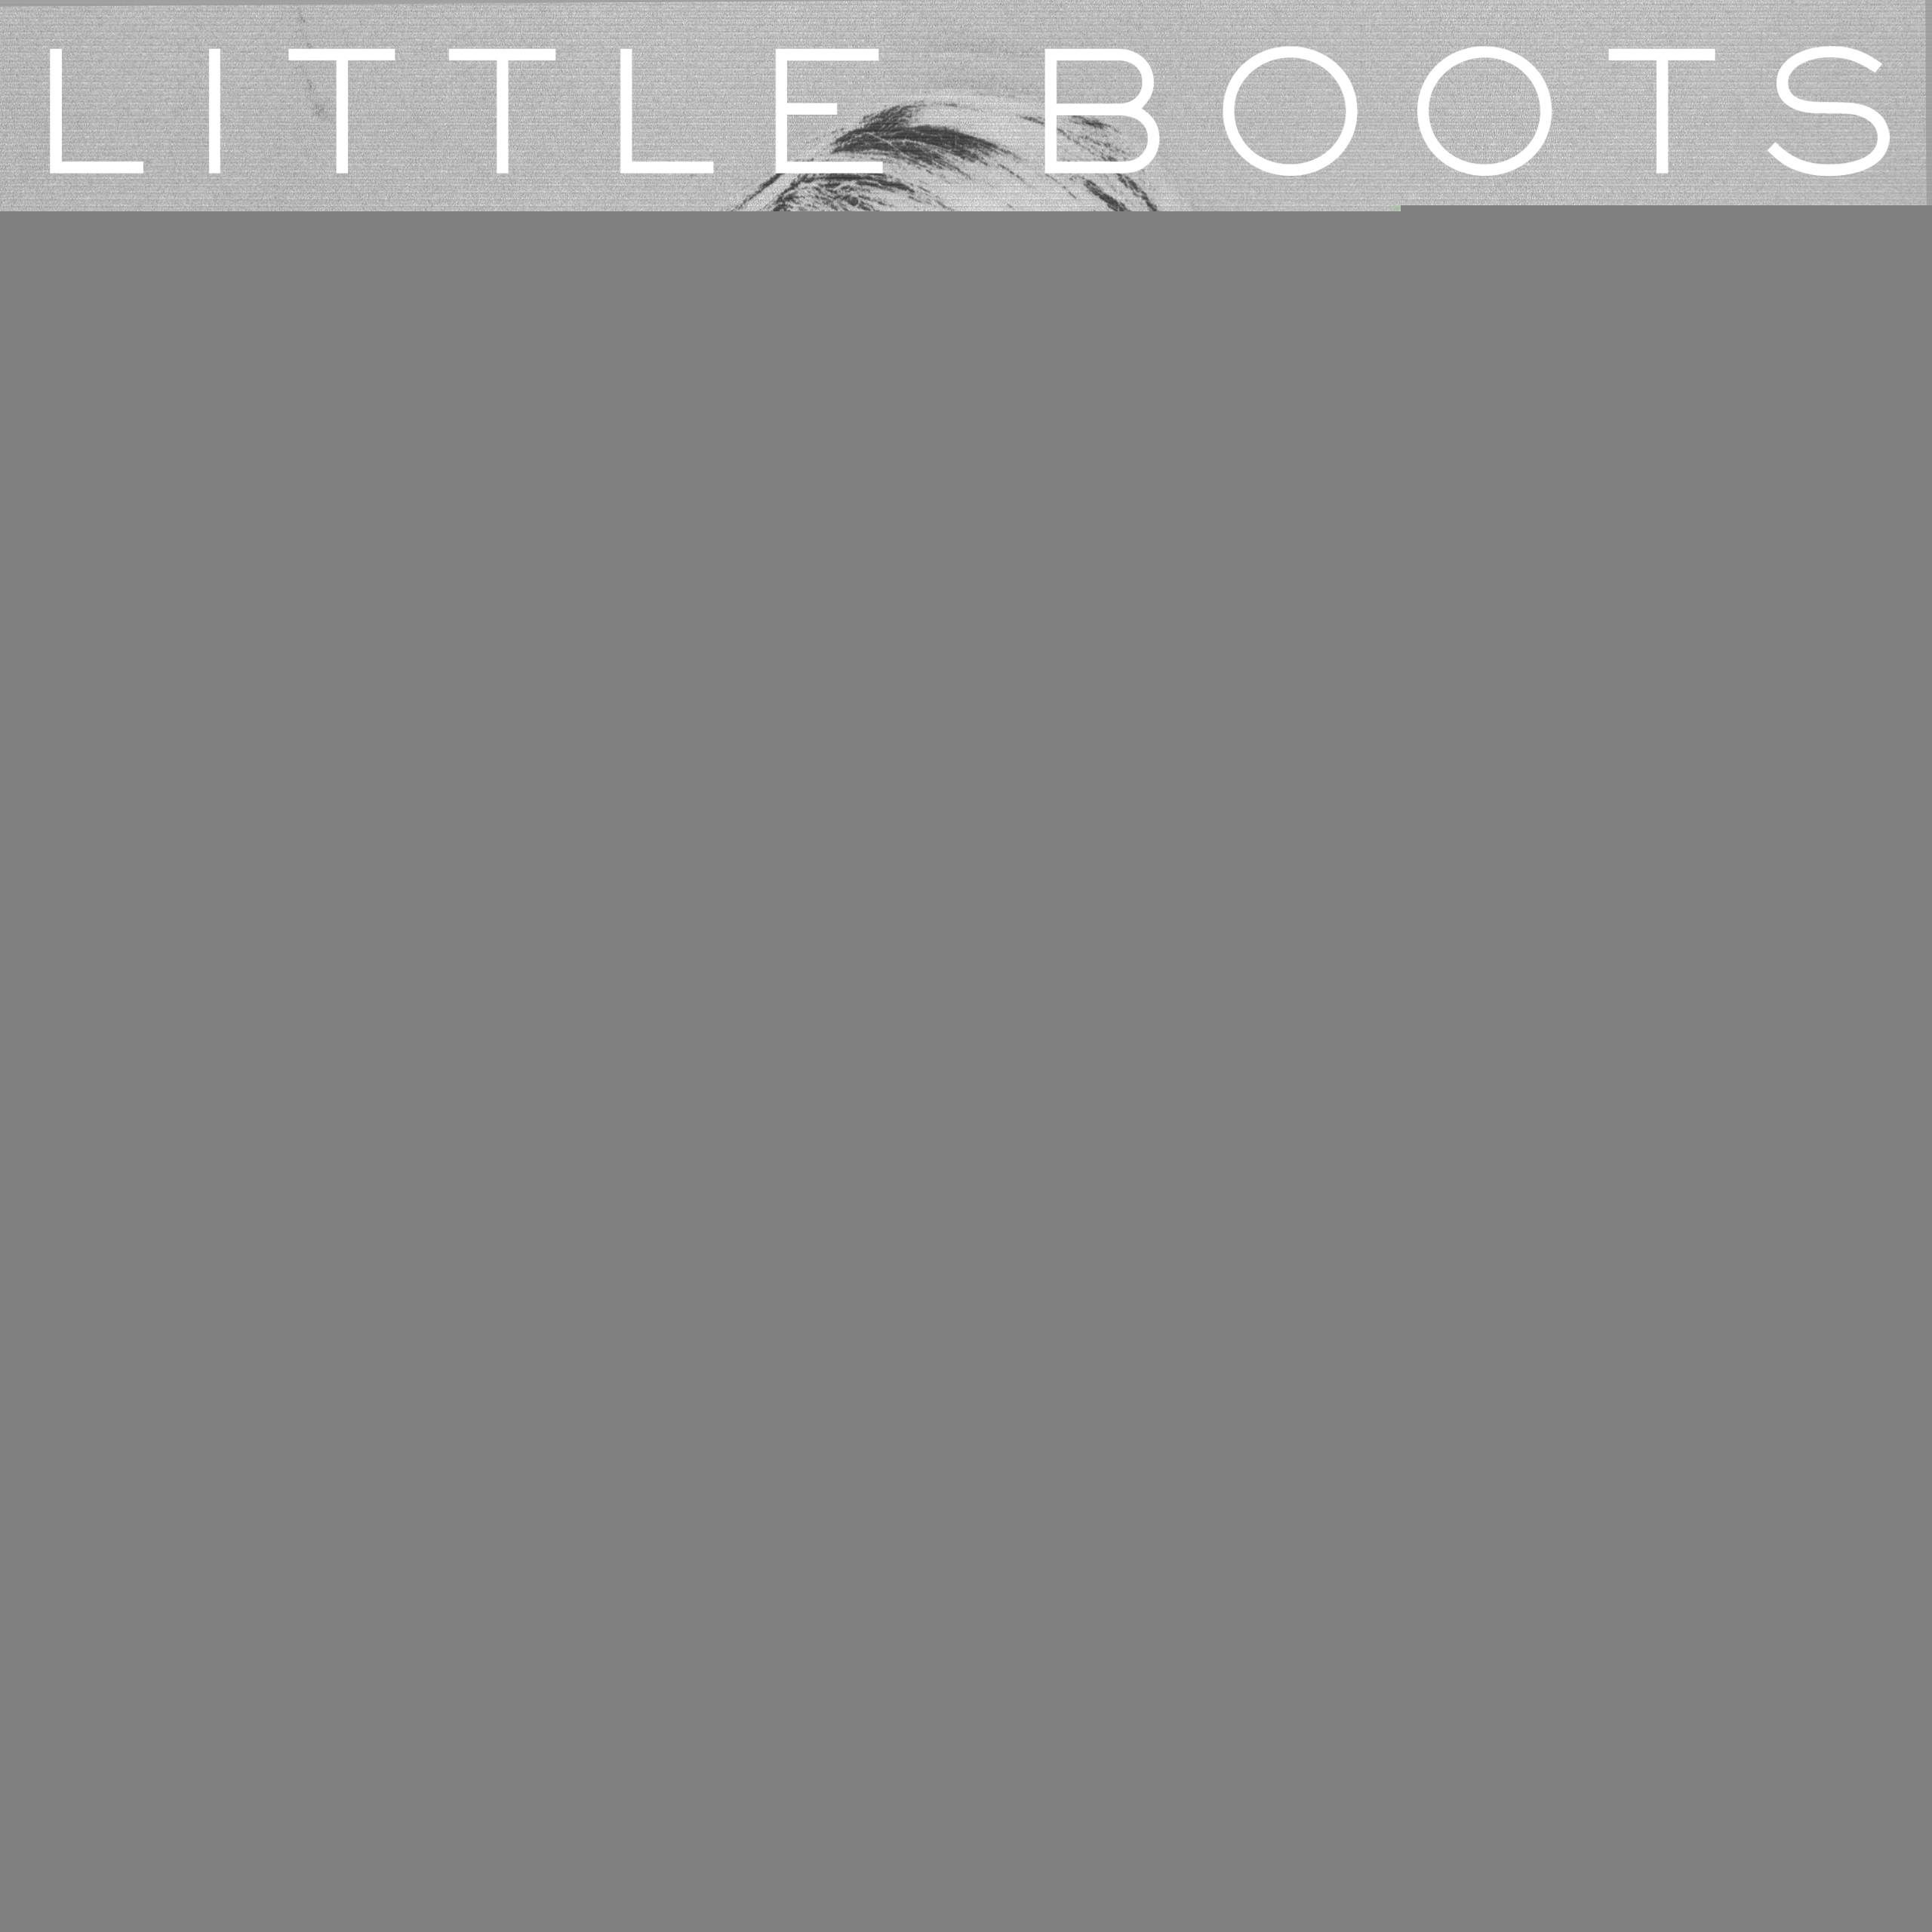 Little Boots Headphones cover art